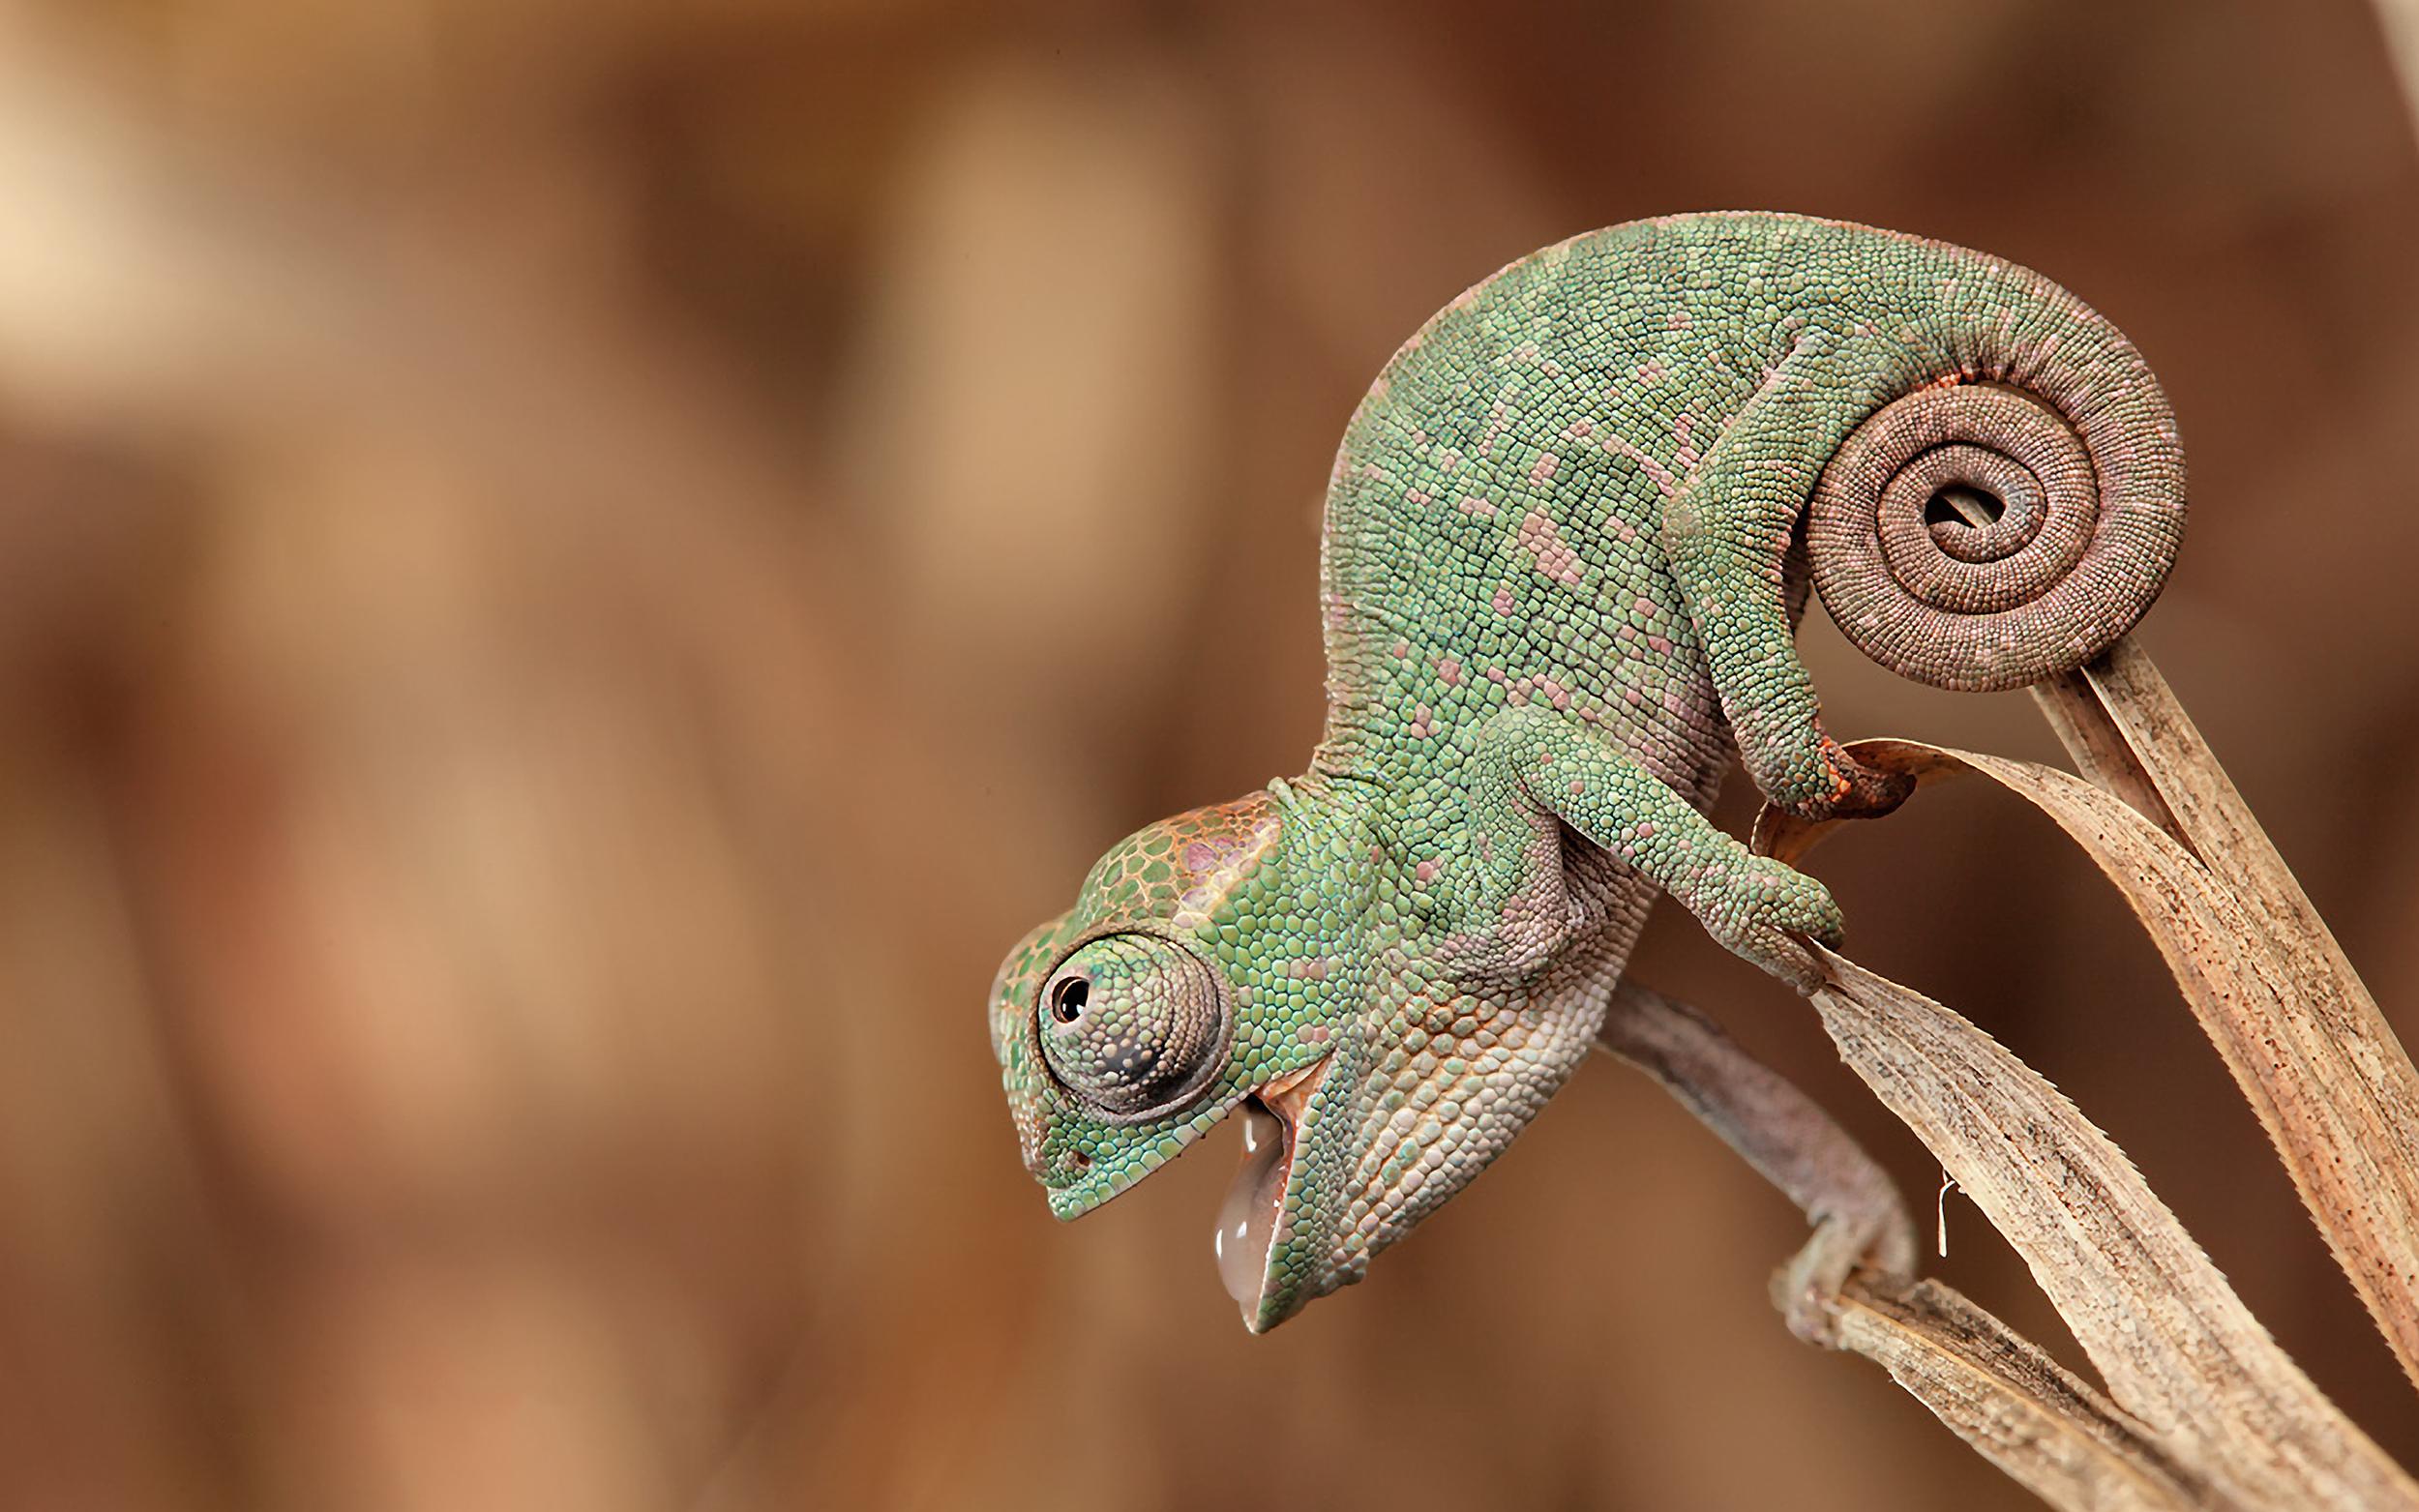 chameleons-funny-lizards-reptiles-depth-1554617-2560x1600.png